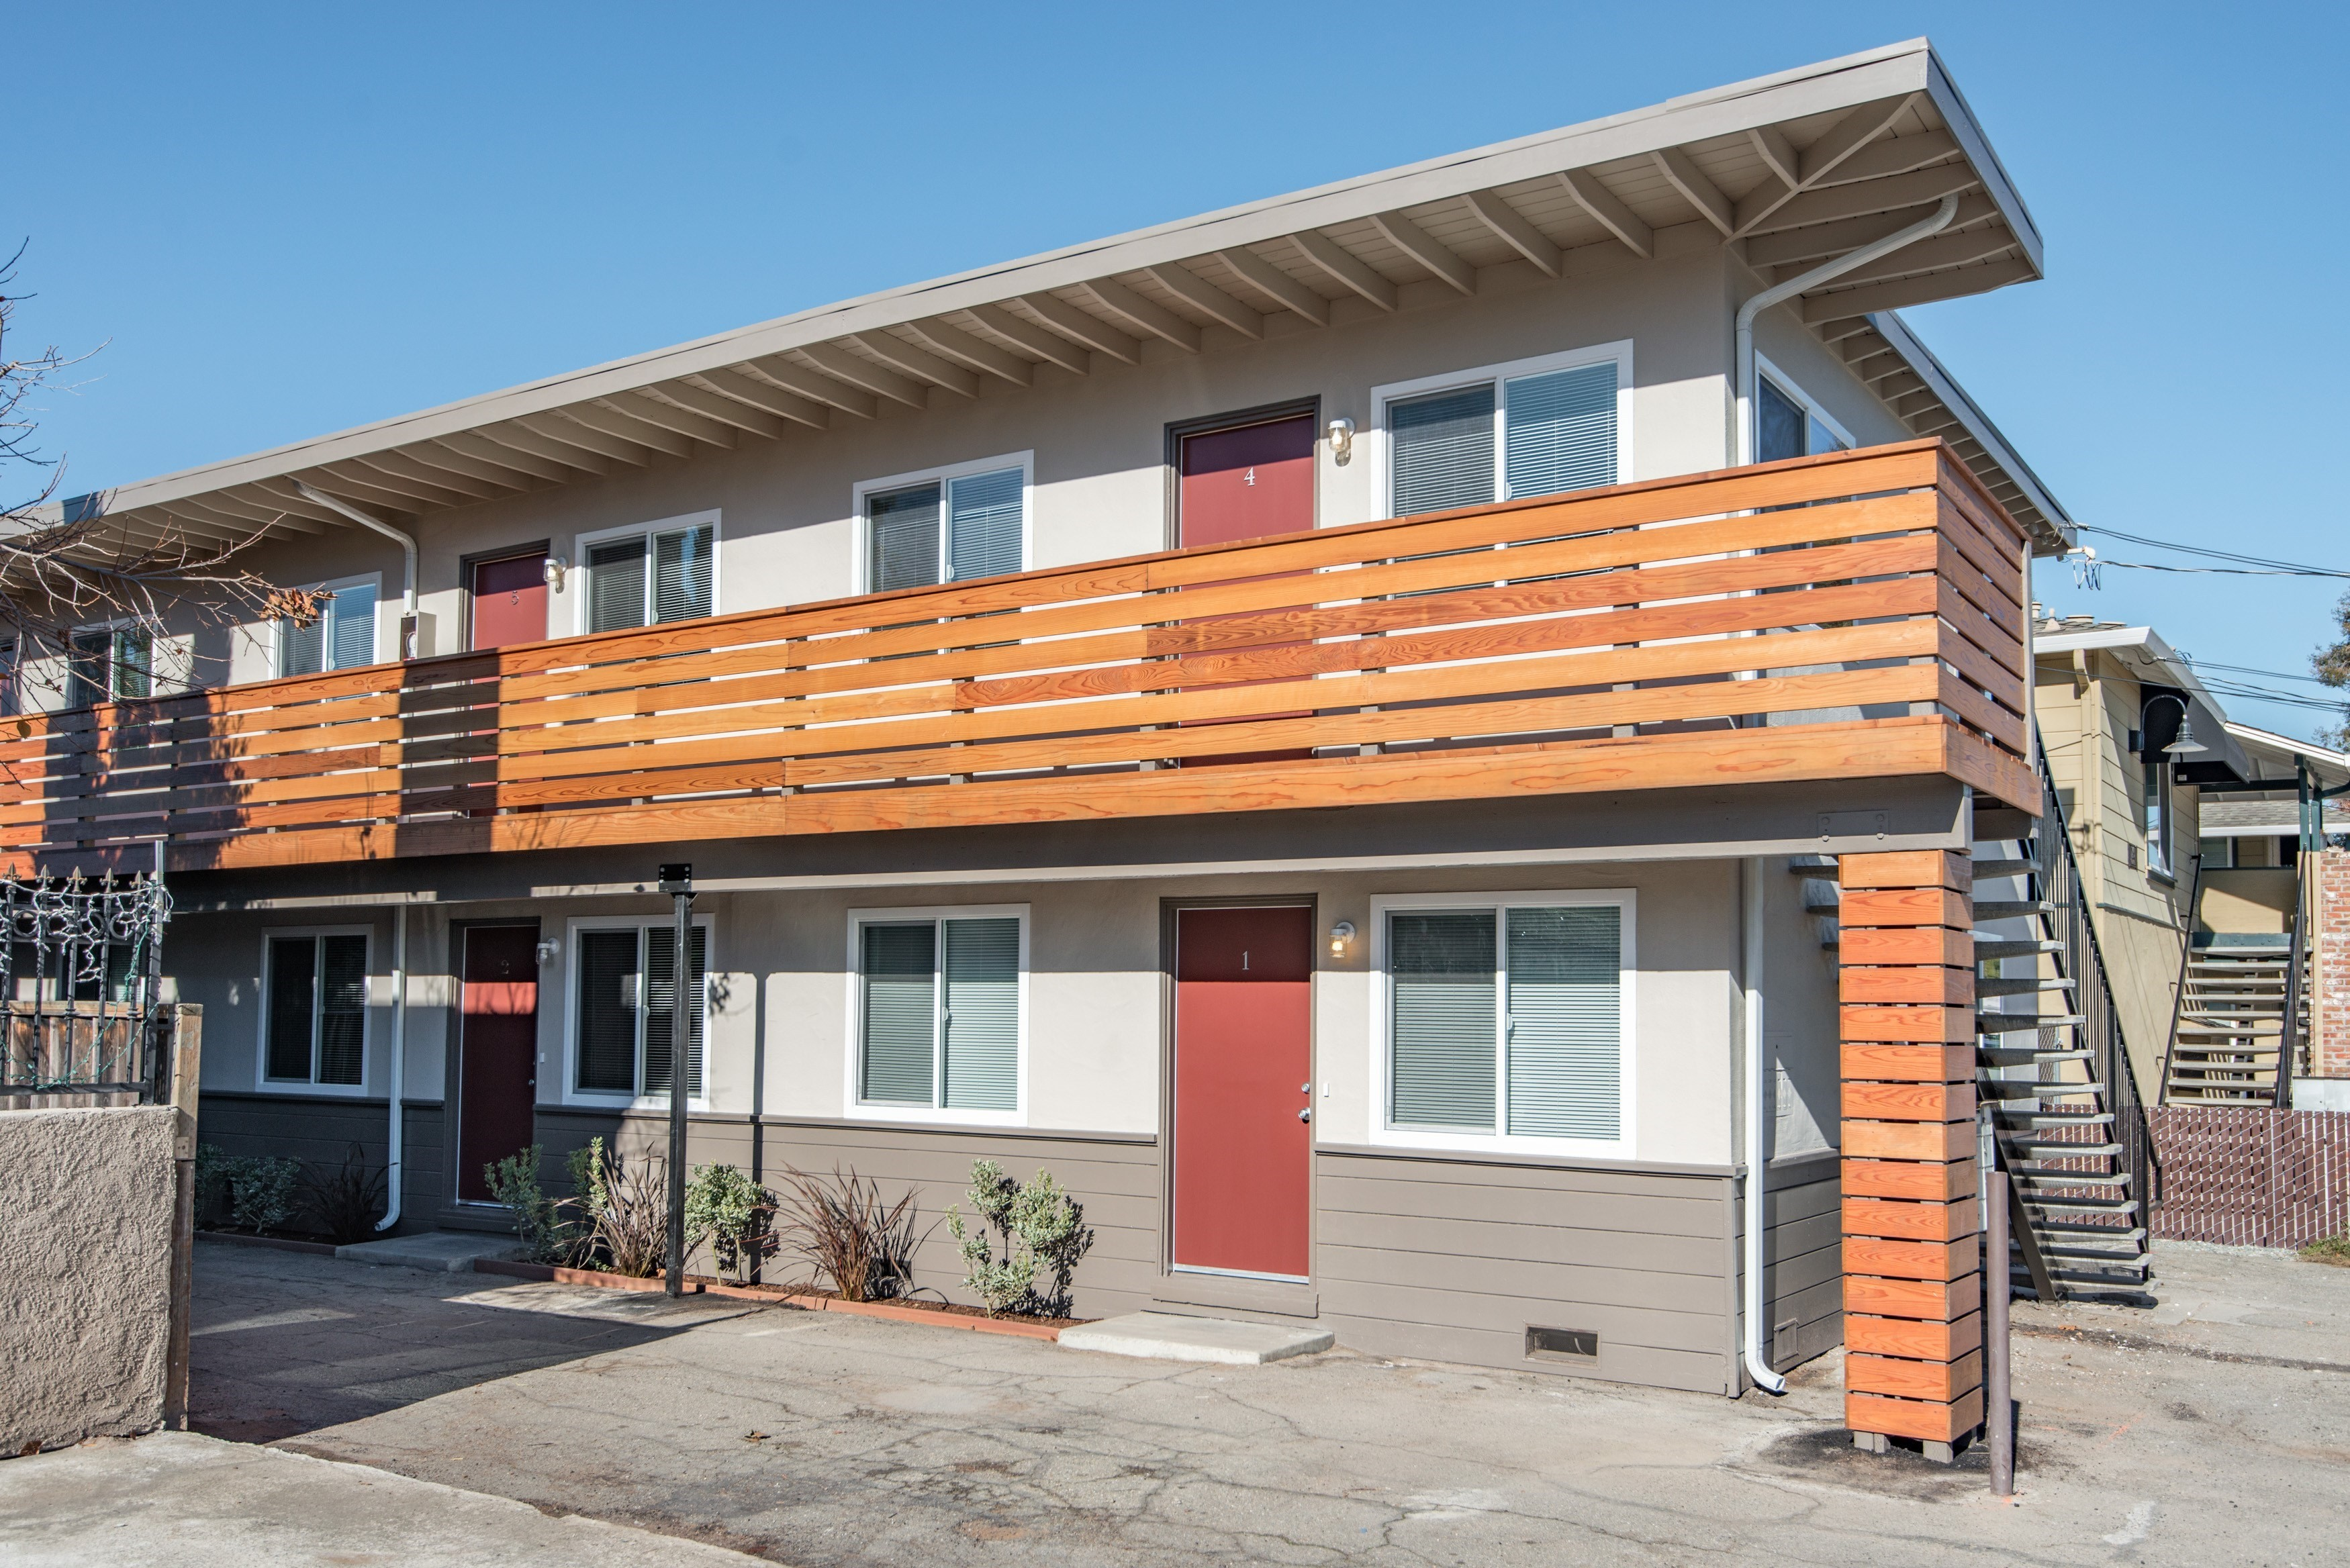 162 Topeka Ave San Jose Ca 95128 1 Bedroom Apartment For Rent Padmapper